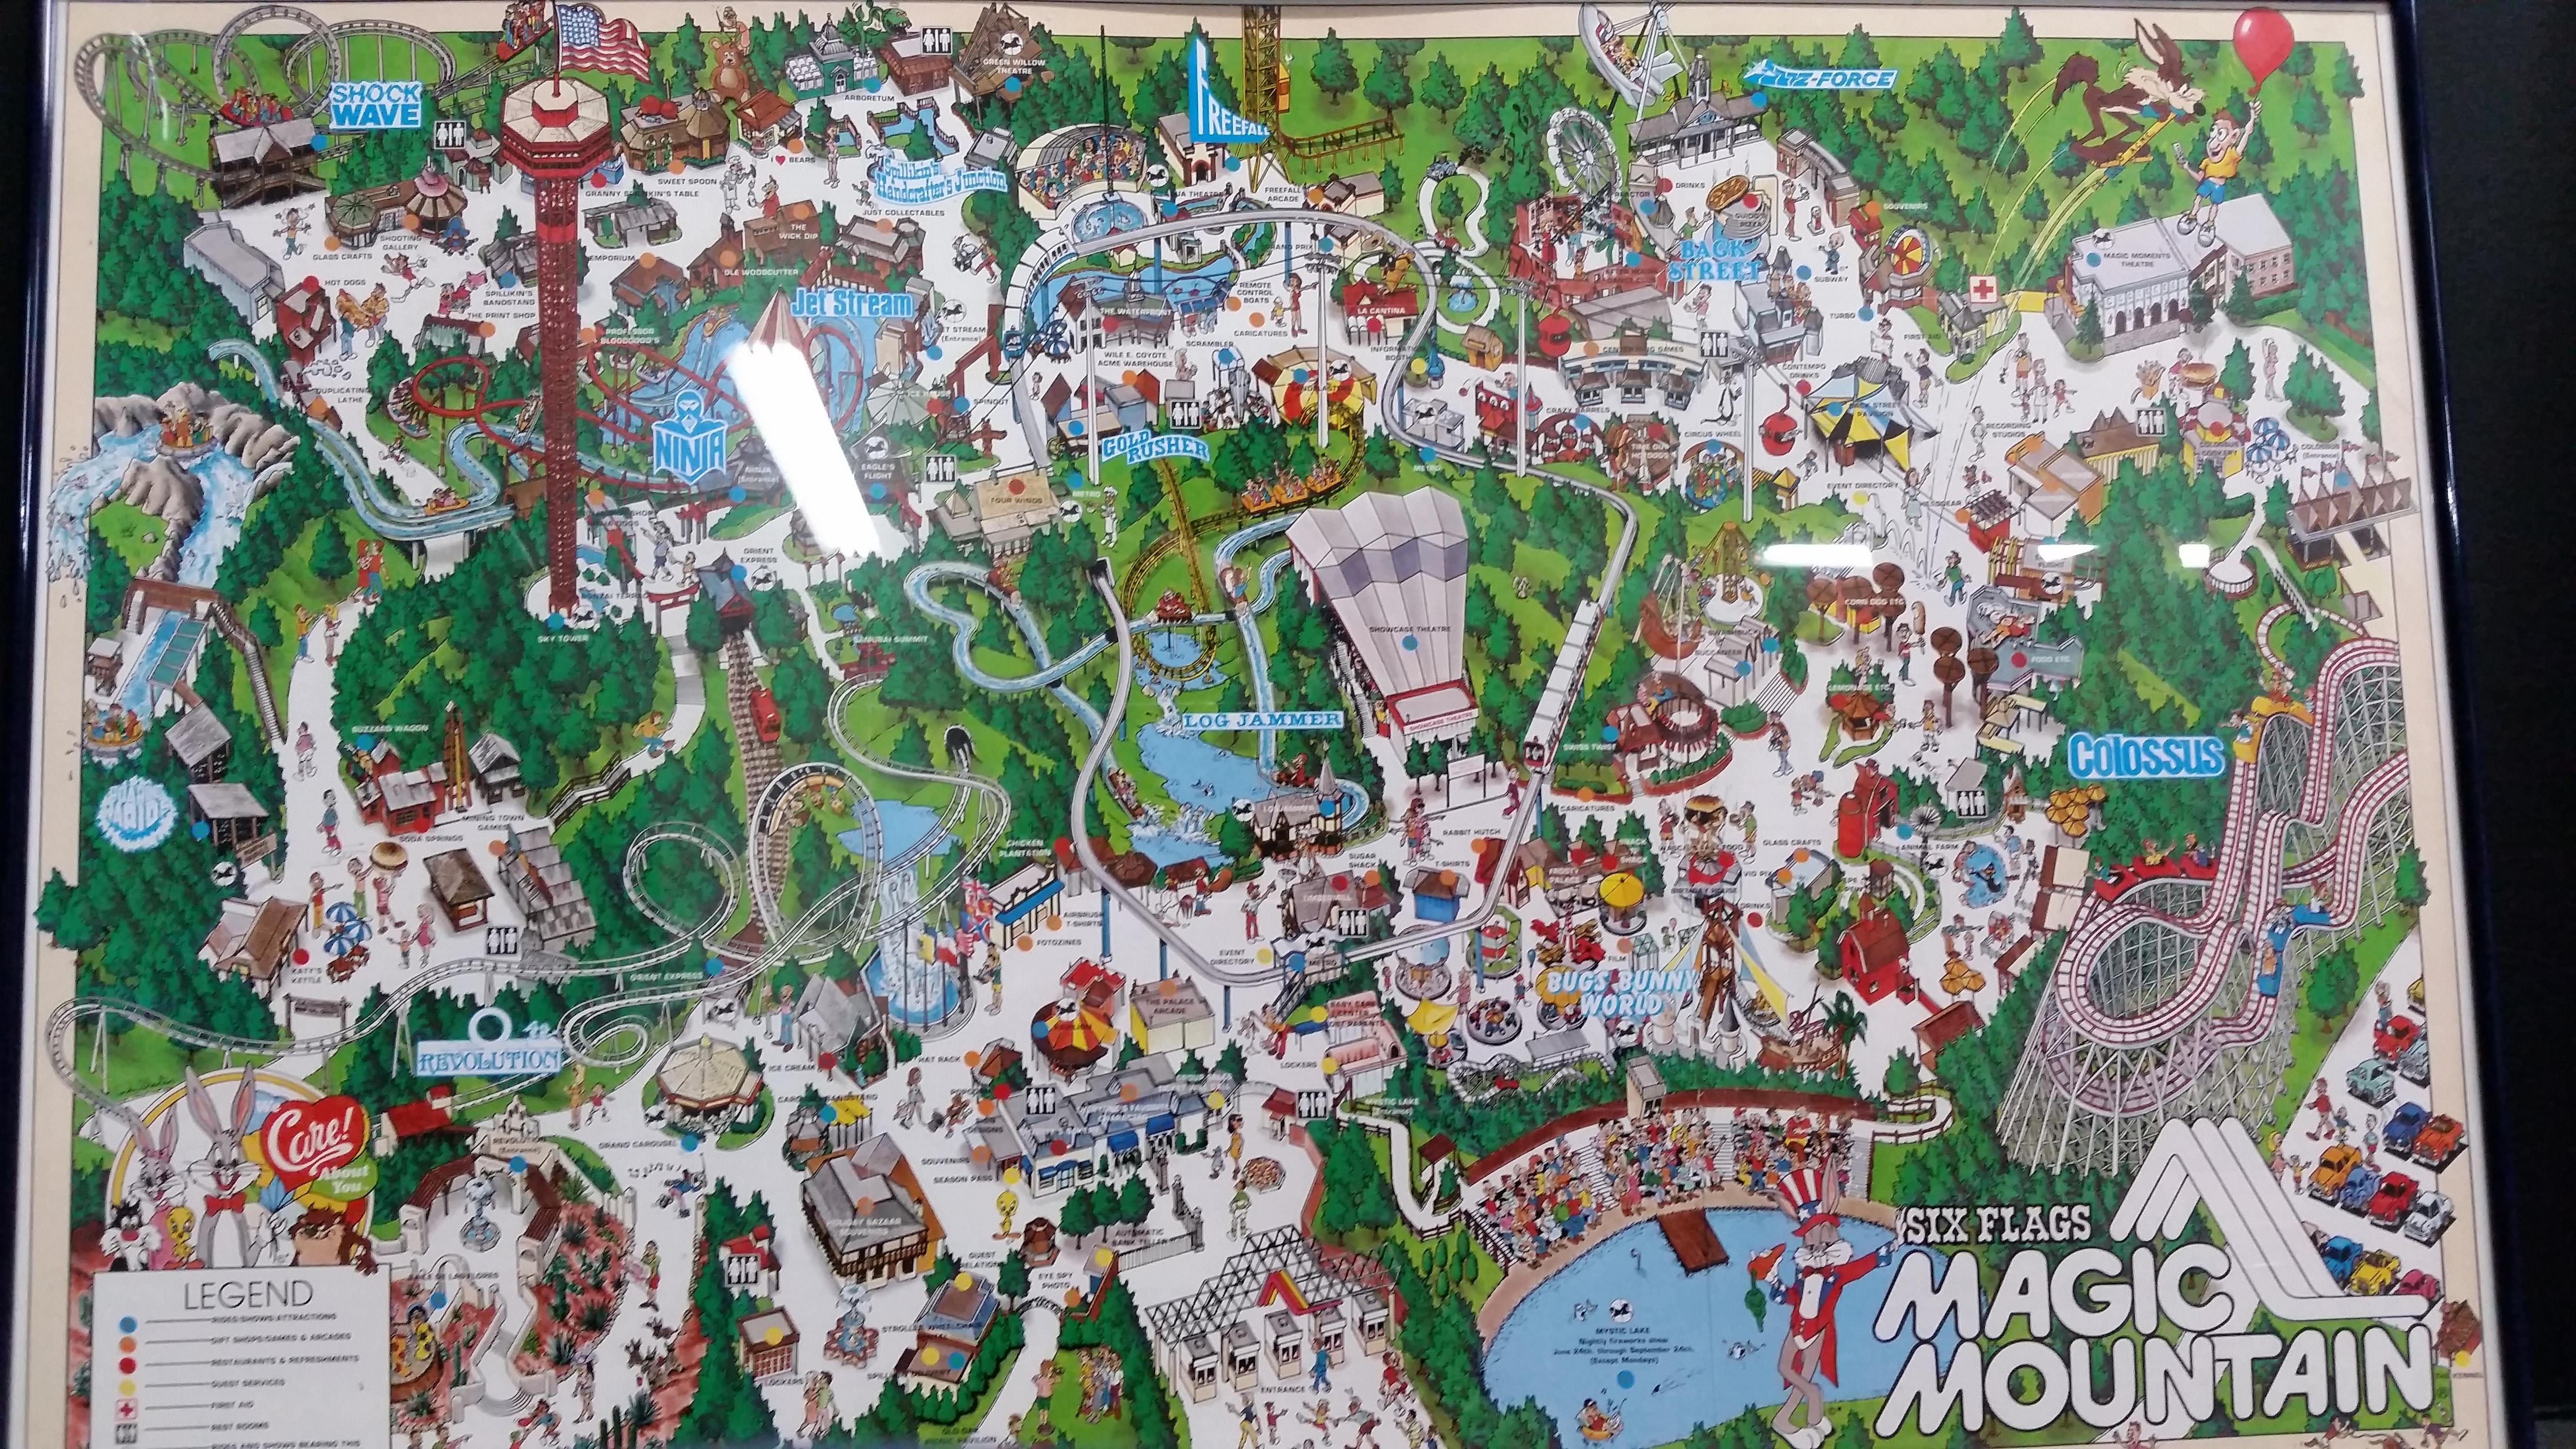 Six Flags Magic Mountain Map From Imgur 3 - Ameliabd - Six Flags Map California 2018